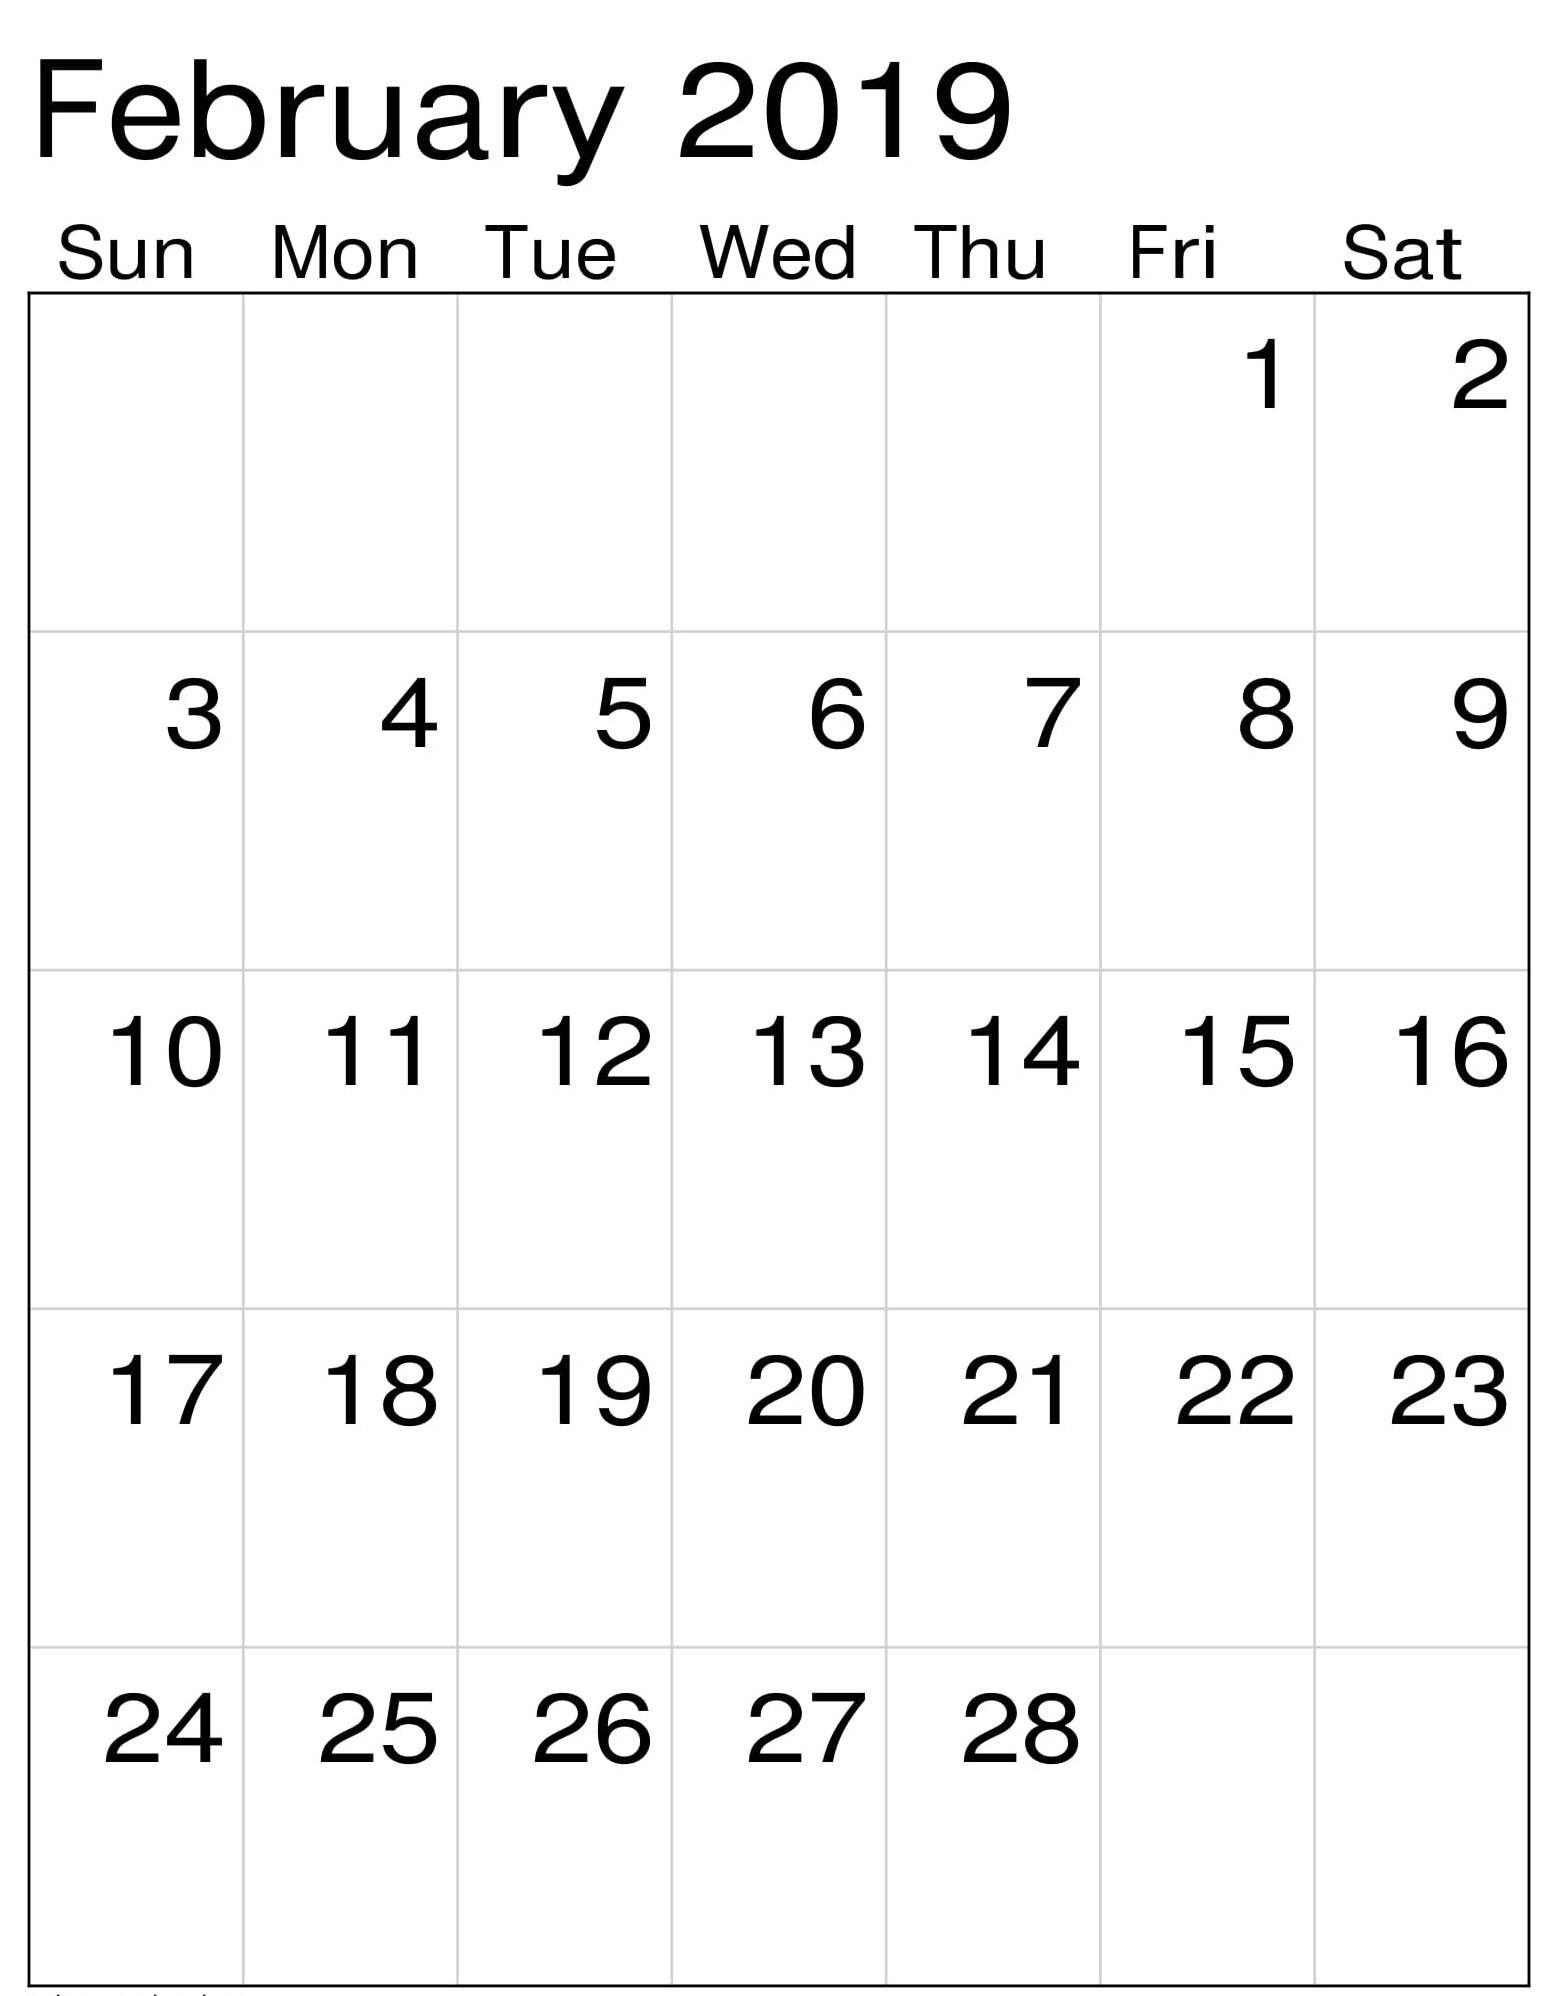 February 2019 Calendar Vertical 2019 Calendar Calendar February